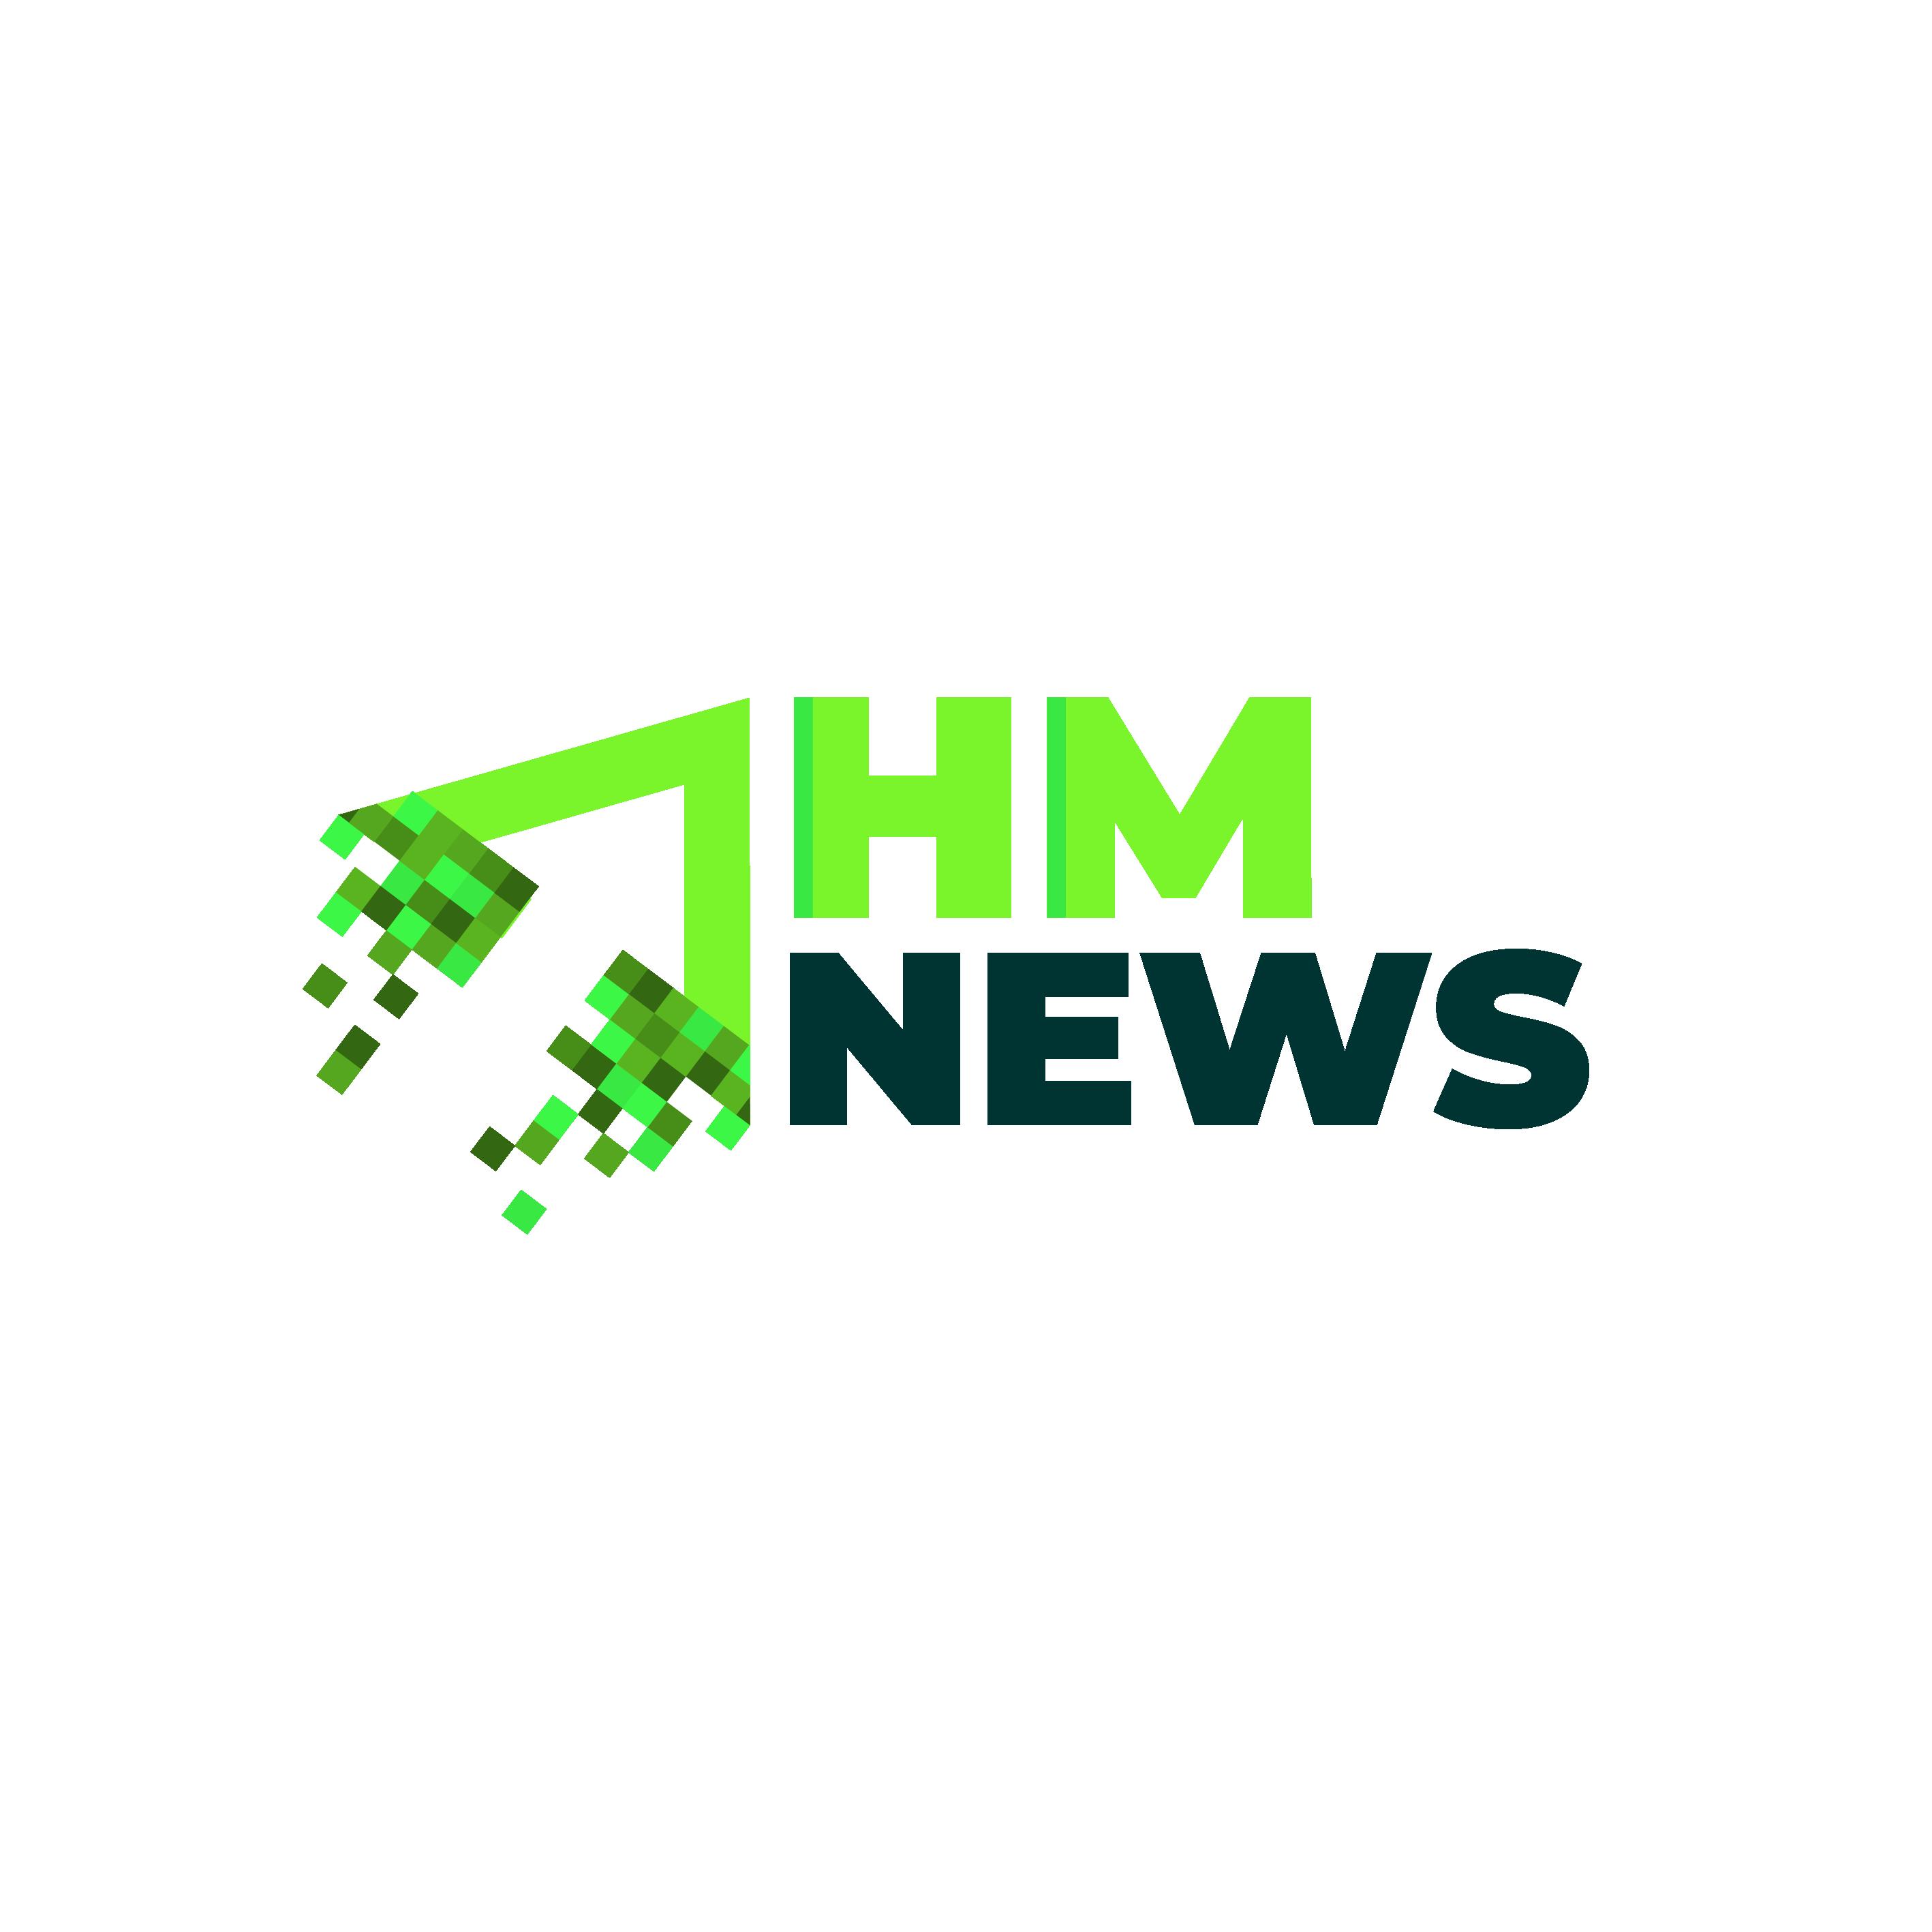 Логотип для информационного агентства фото f_7845aa2b4869d193.png